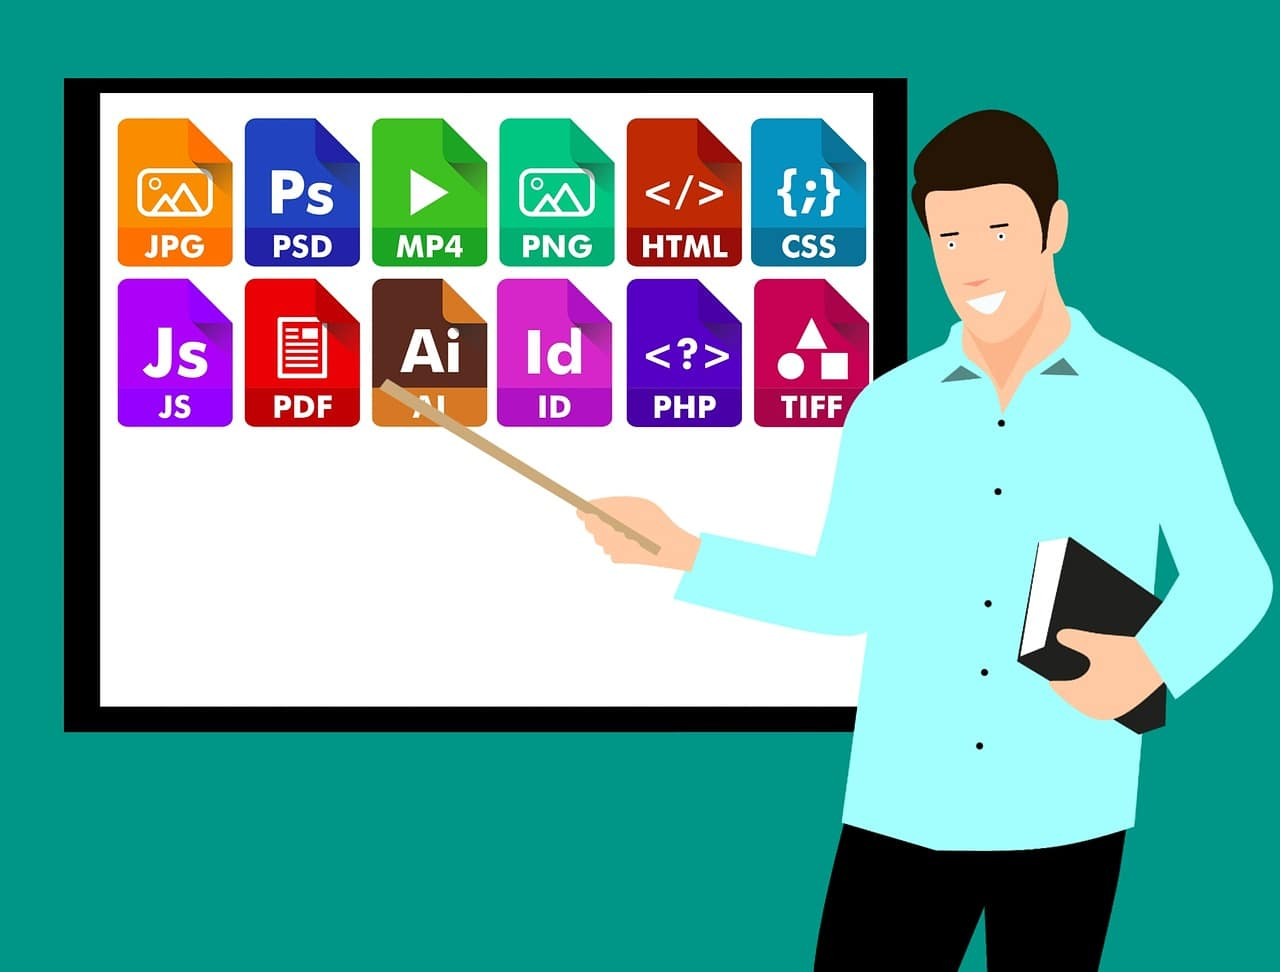 PDF形式の履歴書の利用方法は?種類やポイントをご紹介します